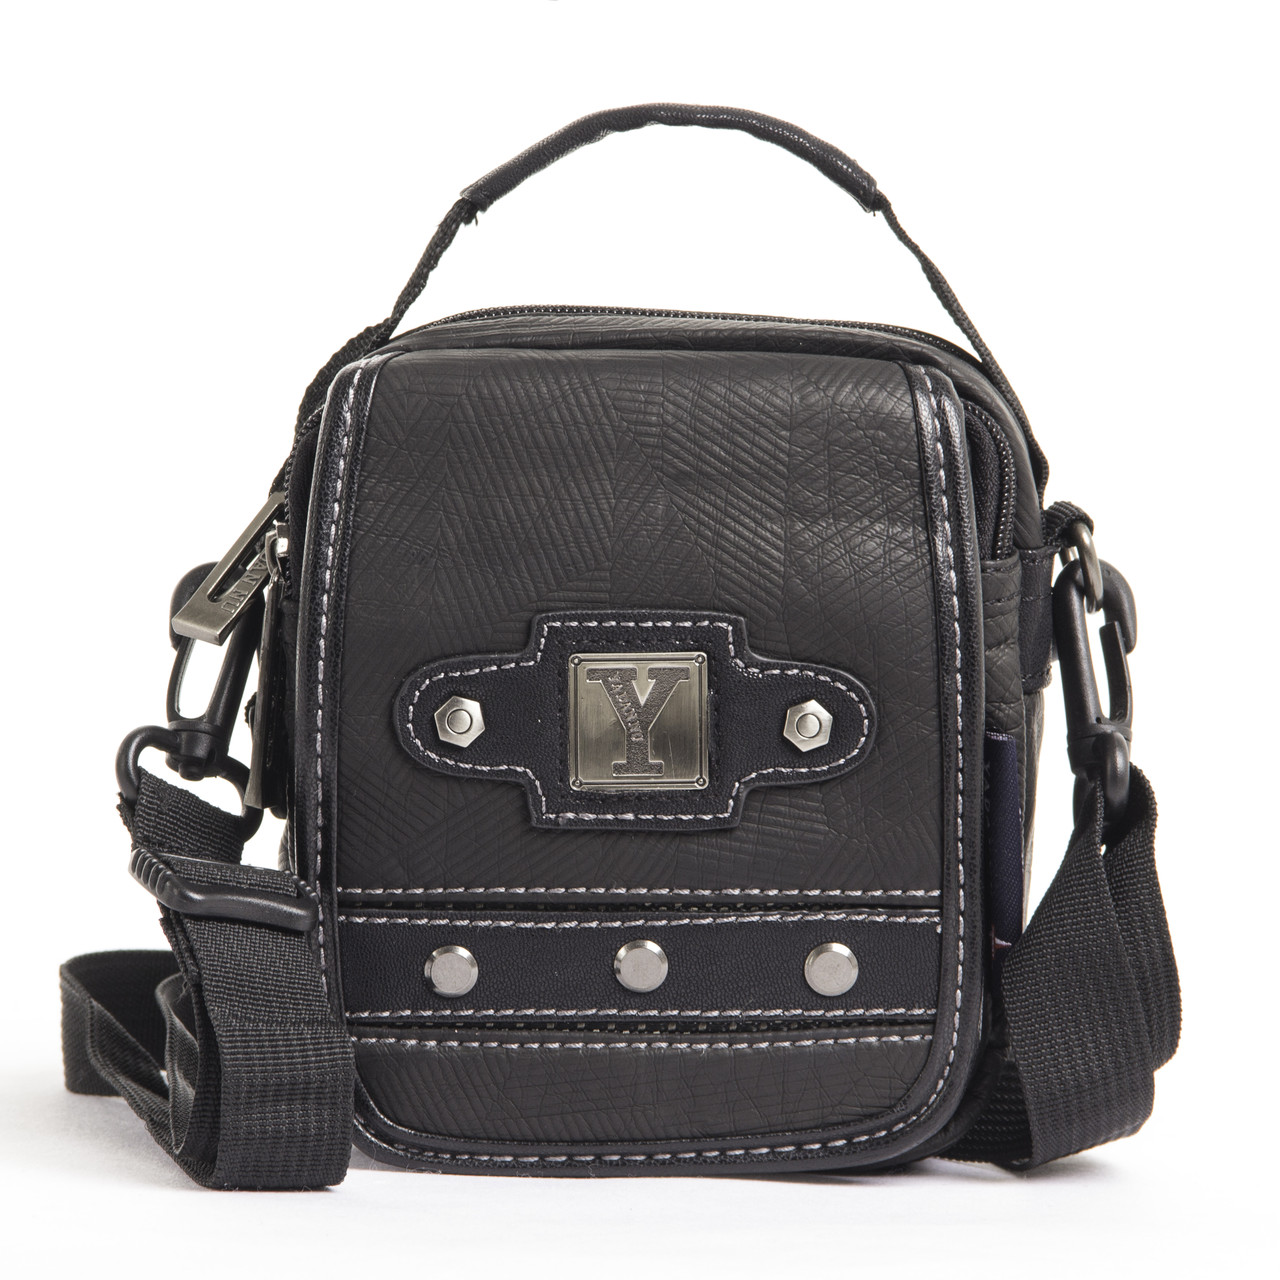 Сумка-кошелёк вертикальная, YADAN чёрная 13 х 16 х 5 ткань нейлон  кс1082